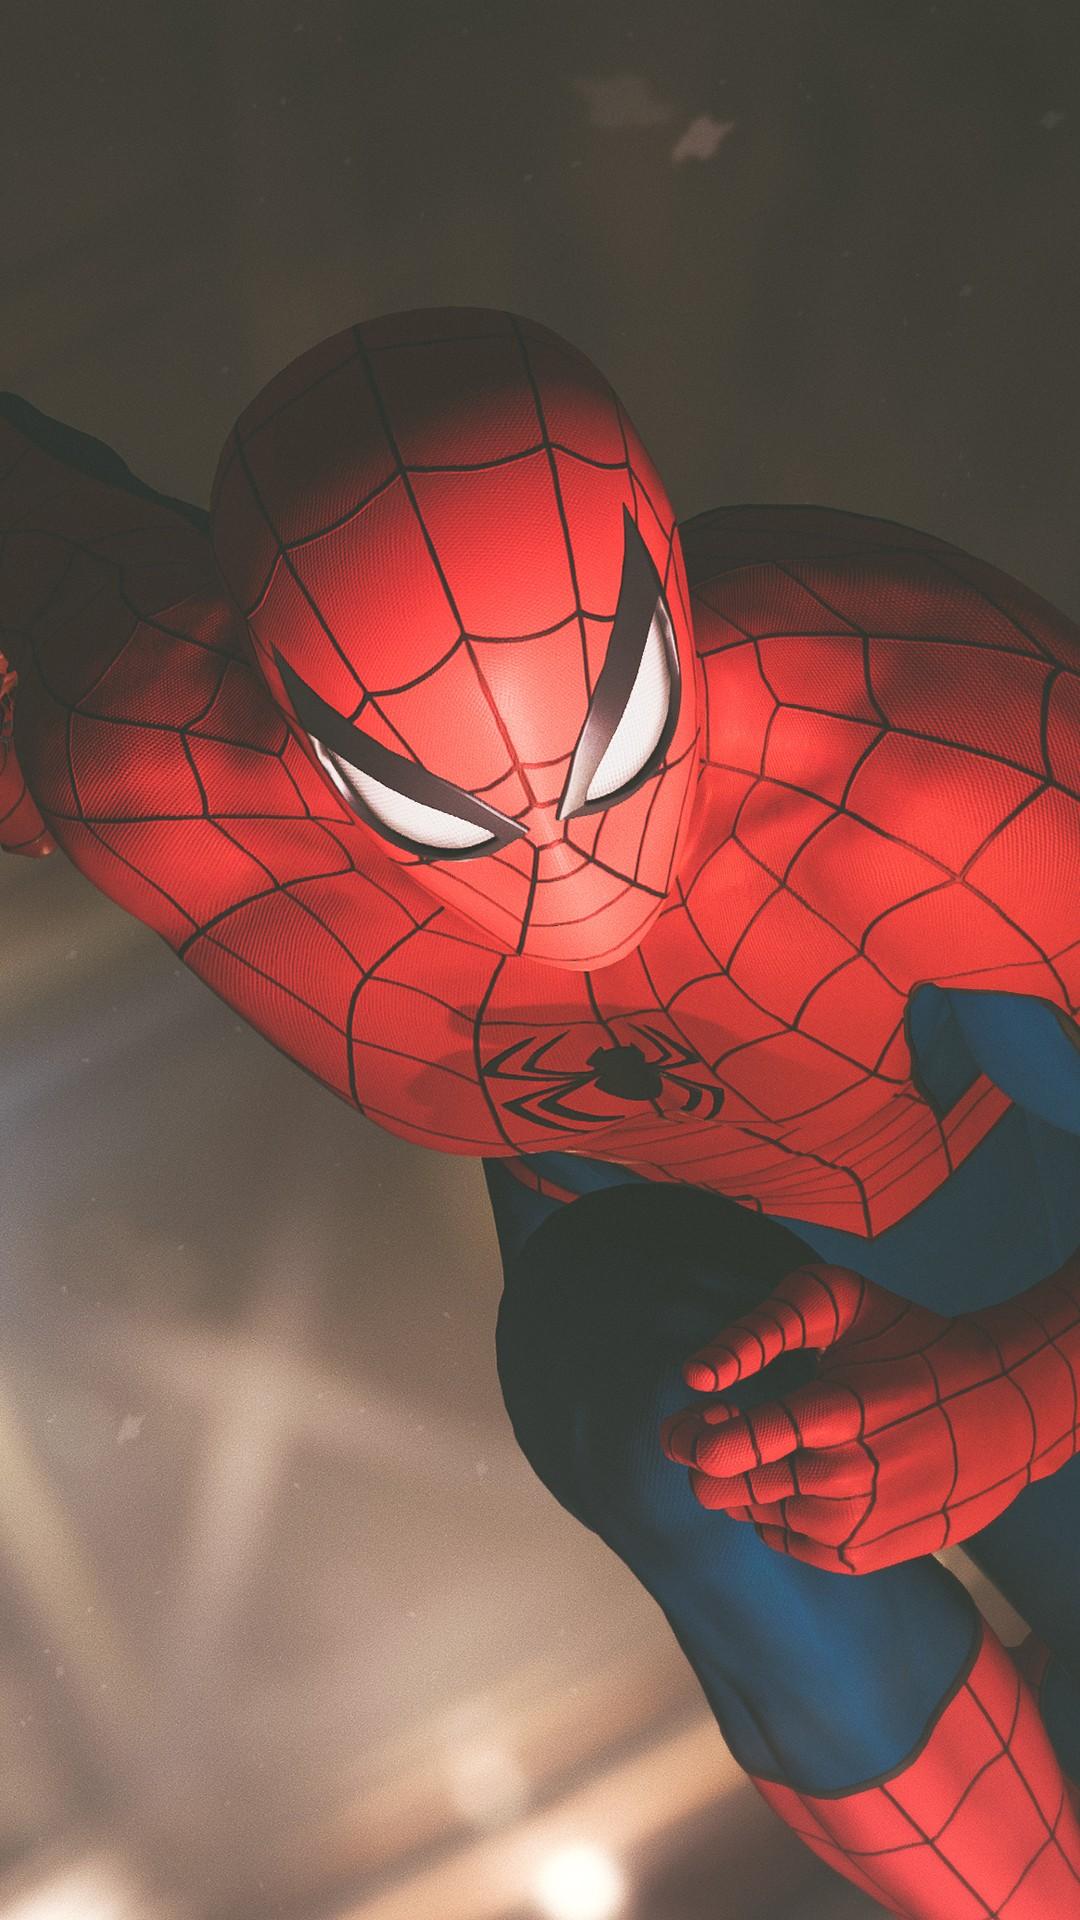 Windows 3d Wallpaper Download Spider Man 4k Wallpapers Hd Wallpapers Id 25774